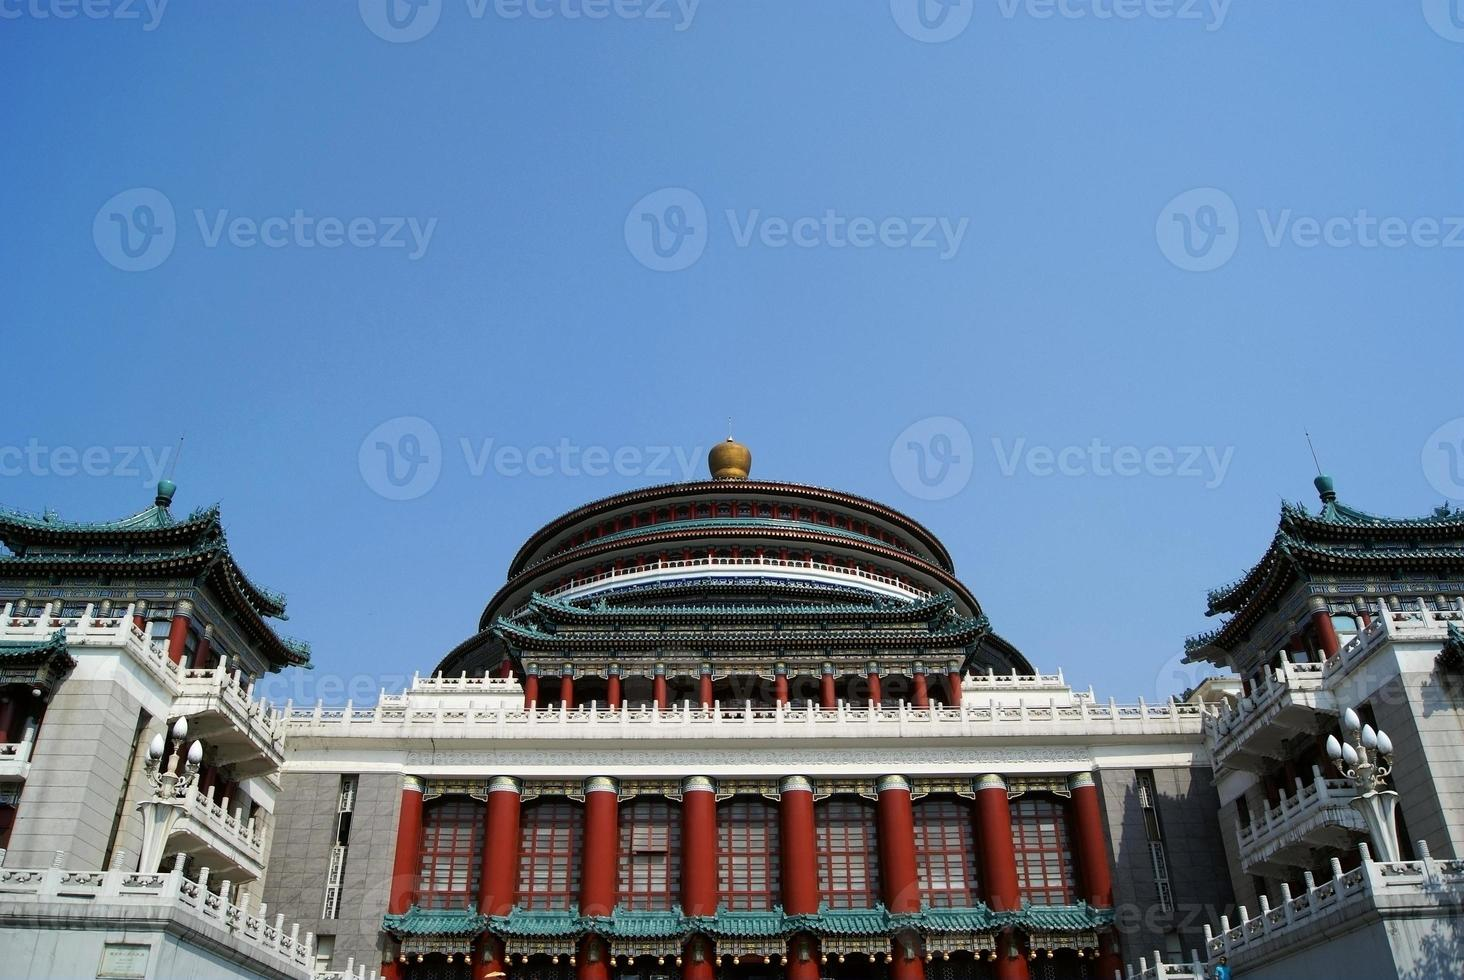 grote zaal van mensen, chongqing, china foto